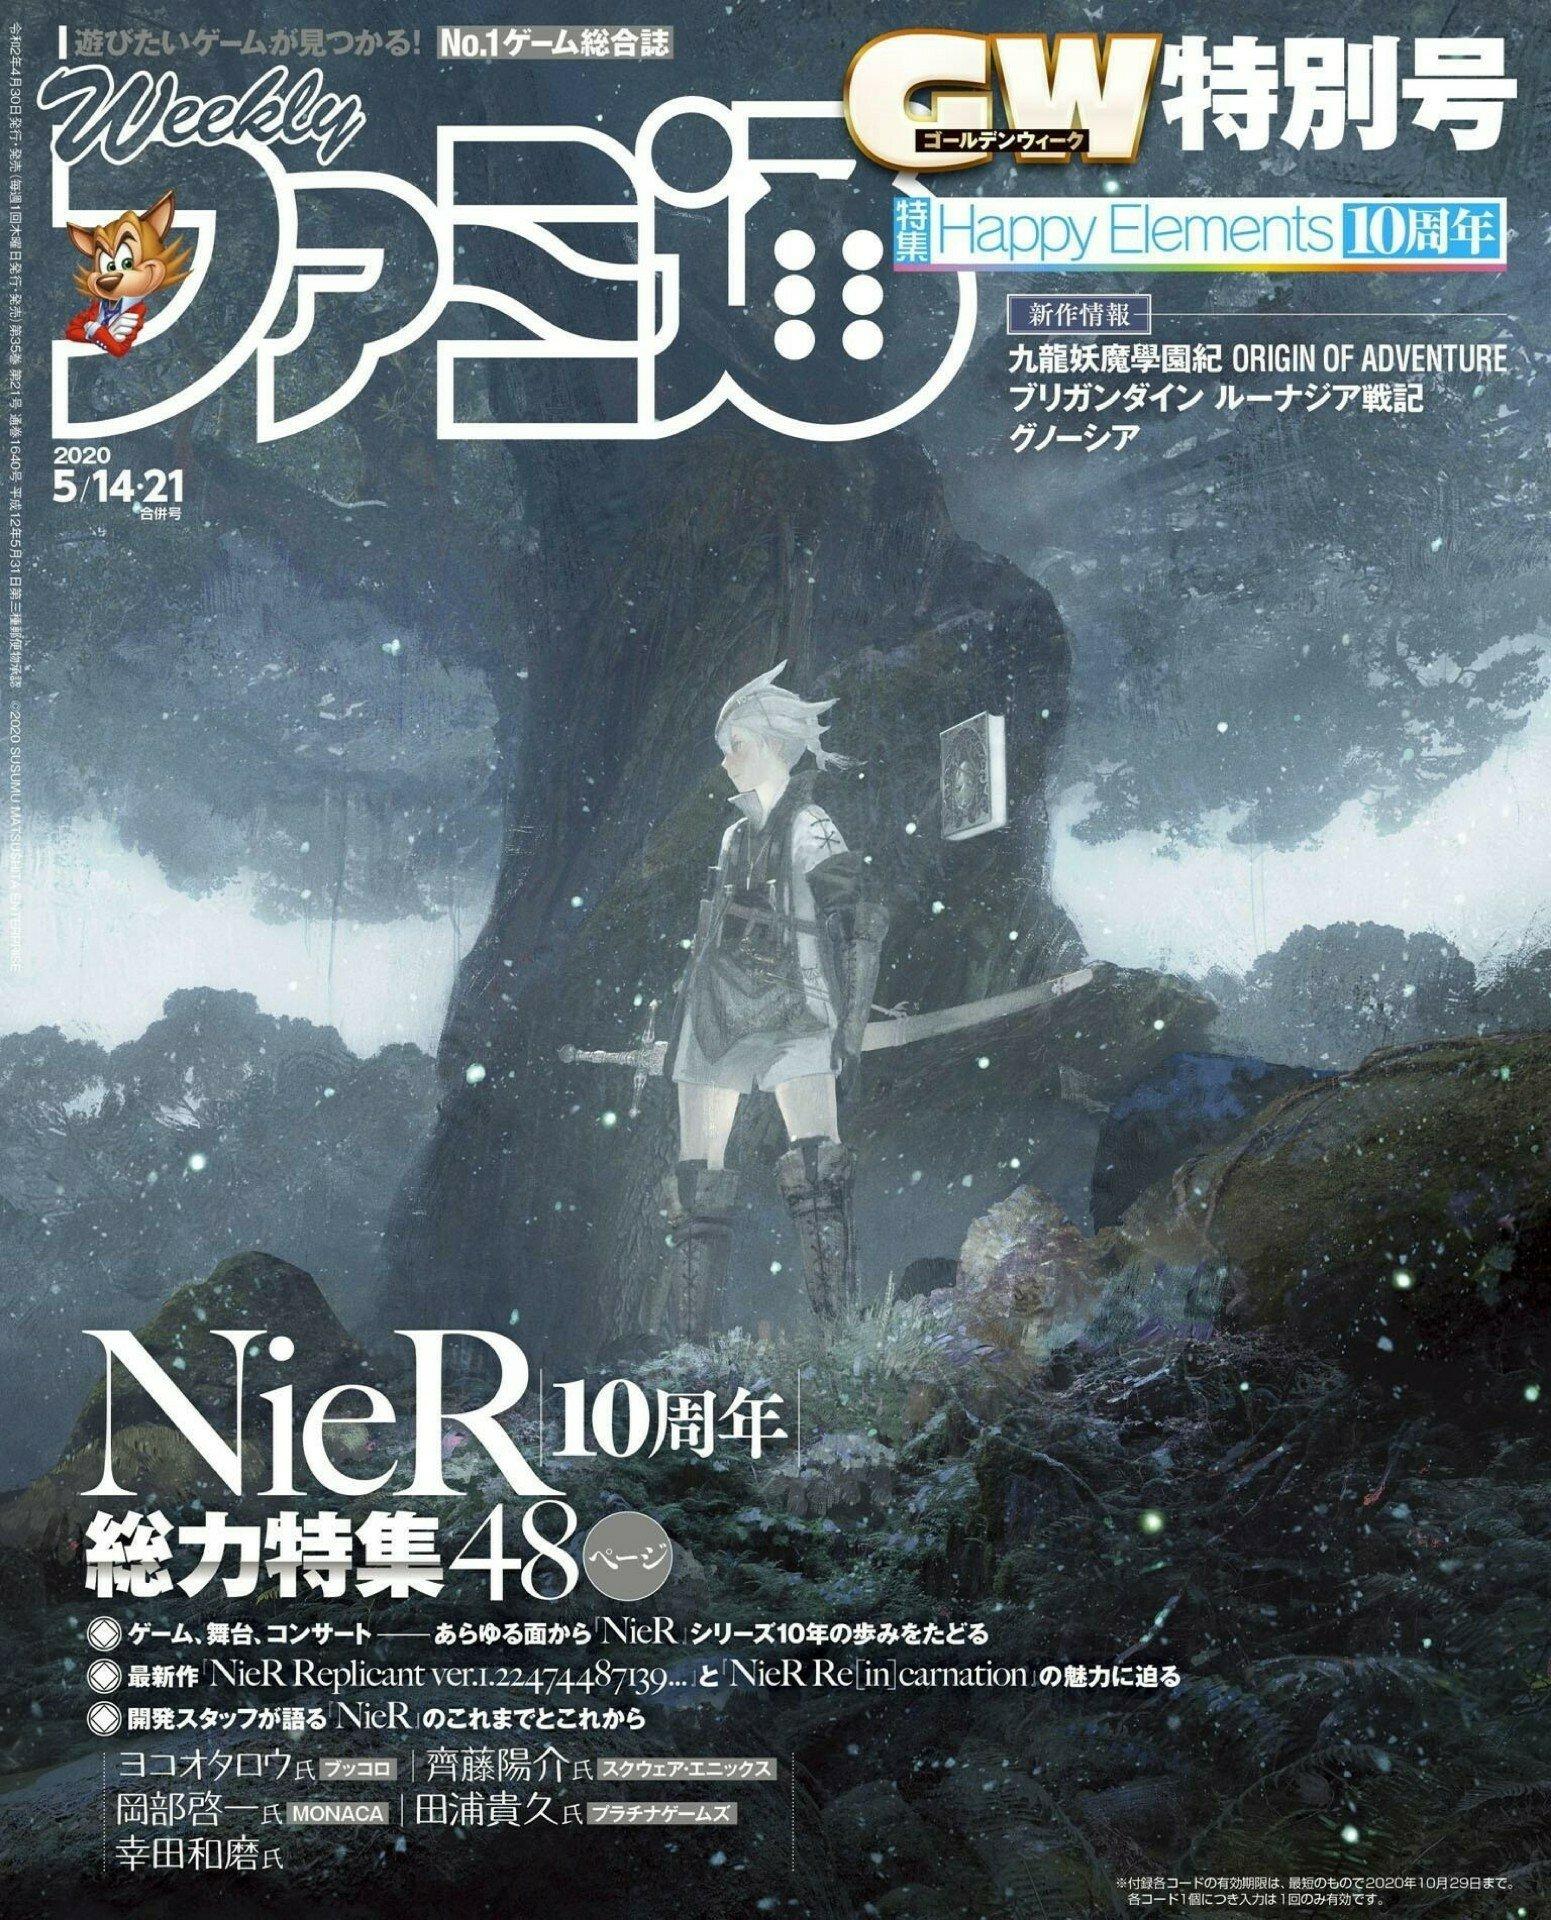 Famitsu 1639/1640 (May 14/21, 2020)